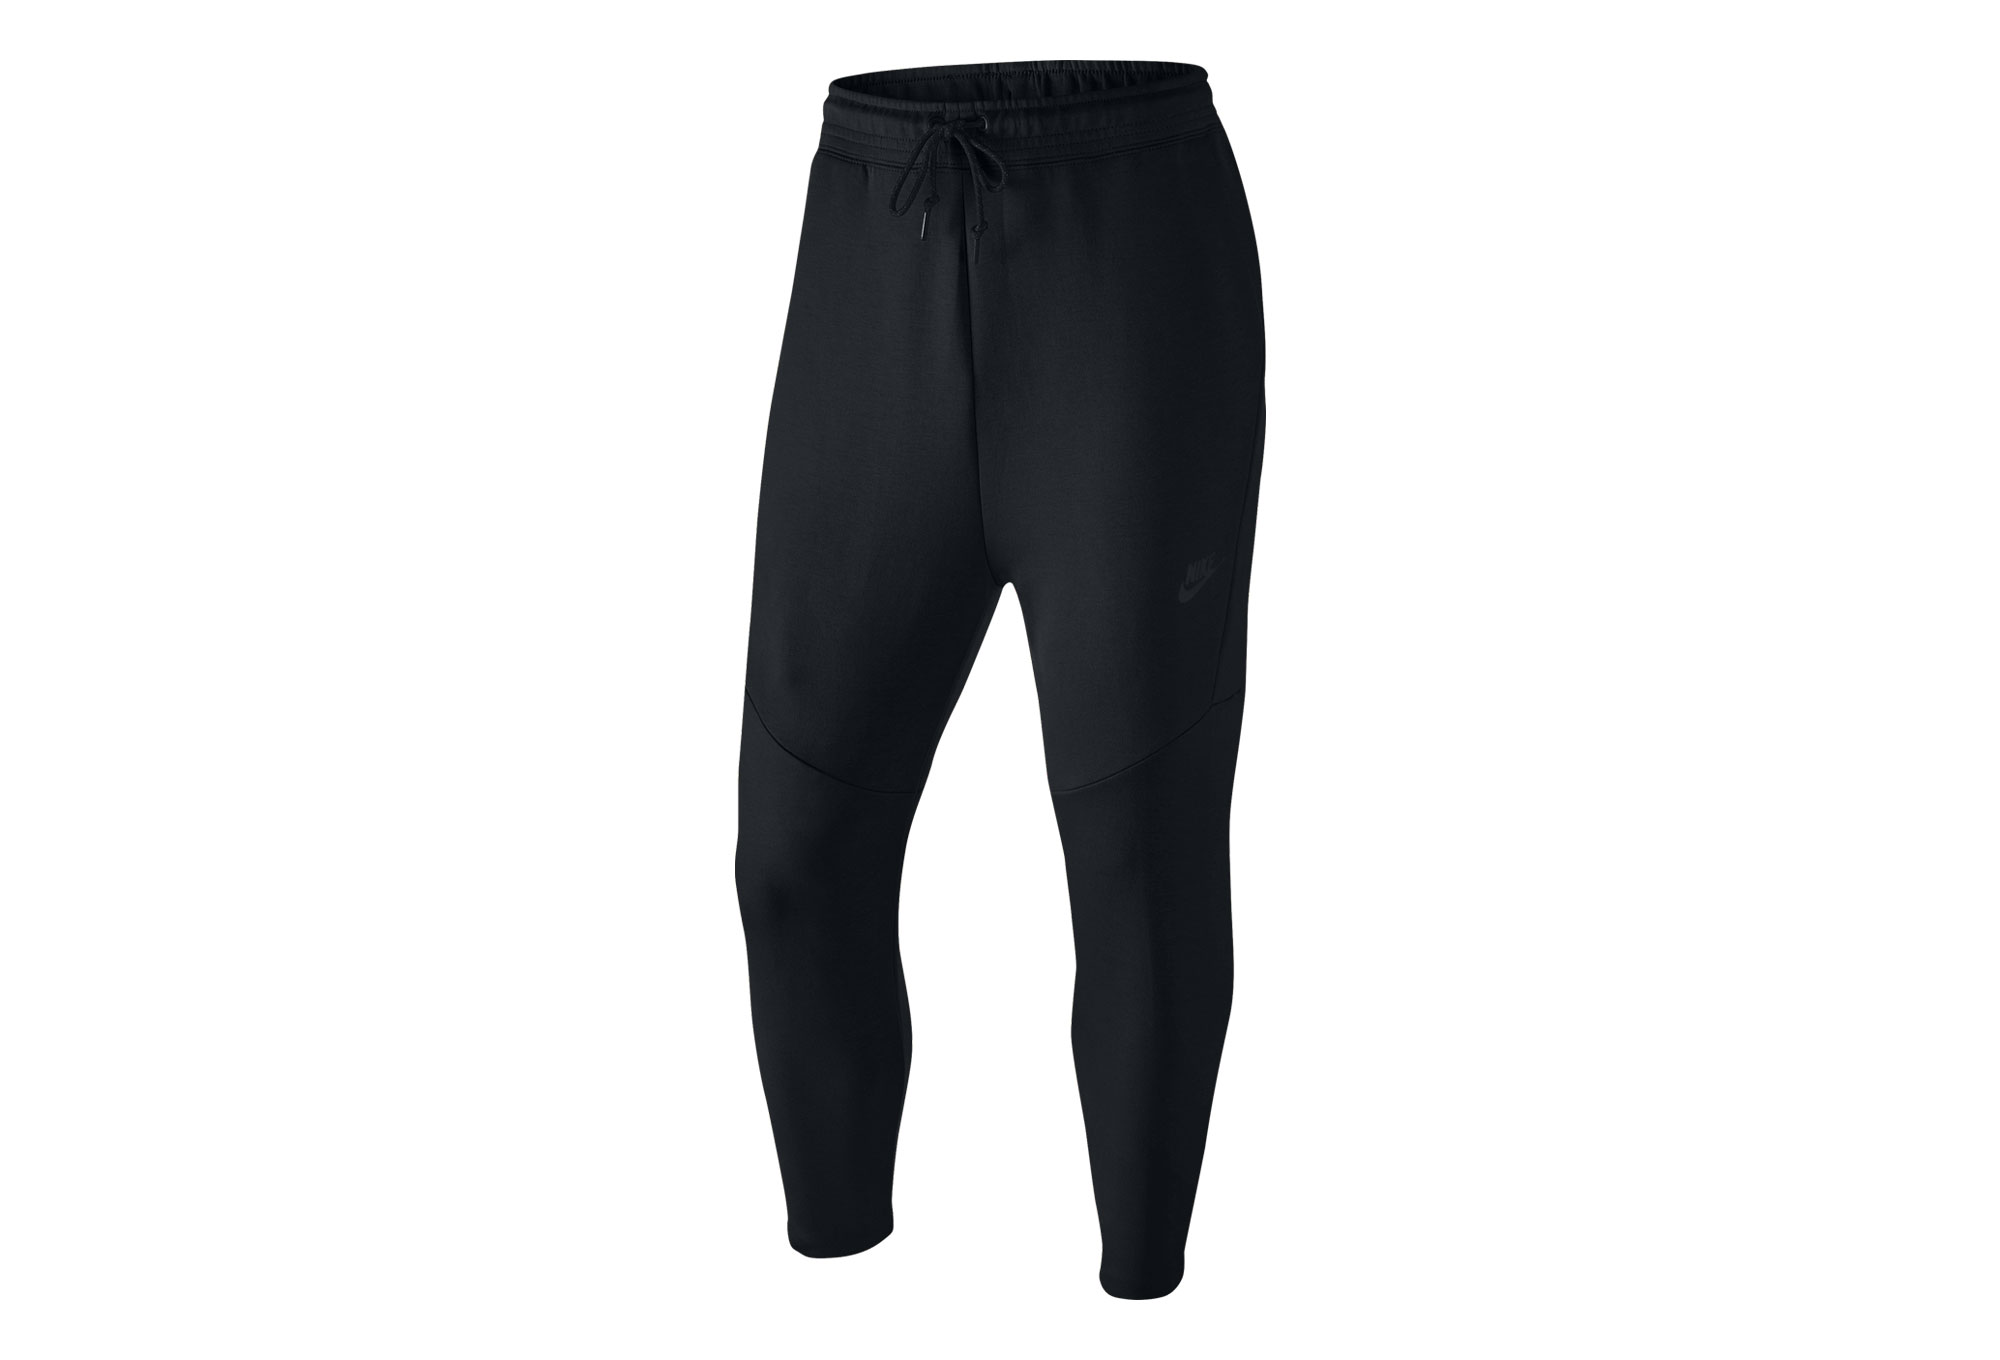 nike pantalon tech fleece cropped noir homme. Black Bedroom Furniture Sets. Home Design Ideas